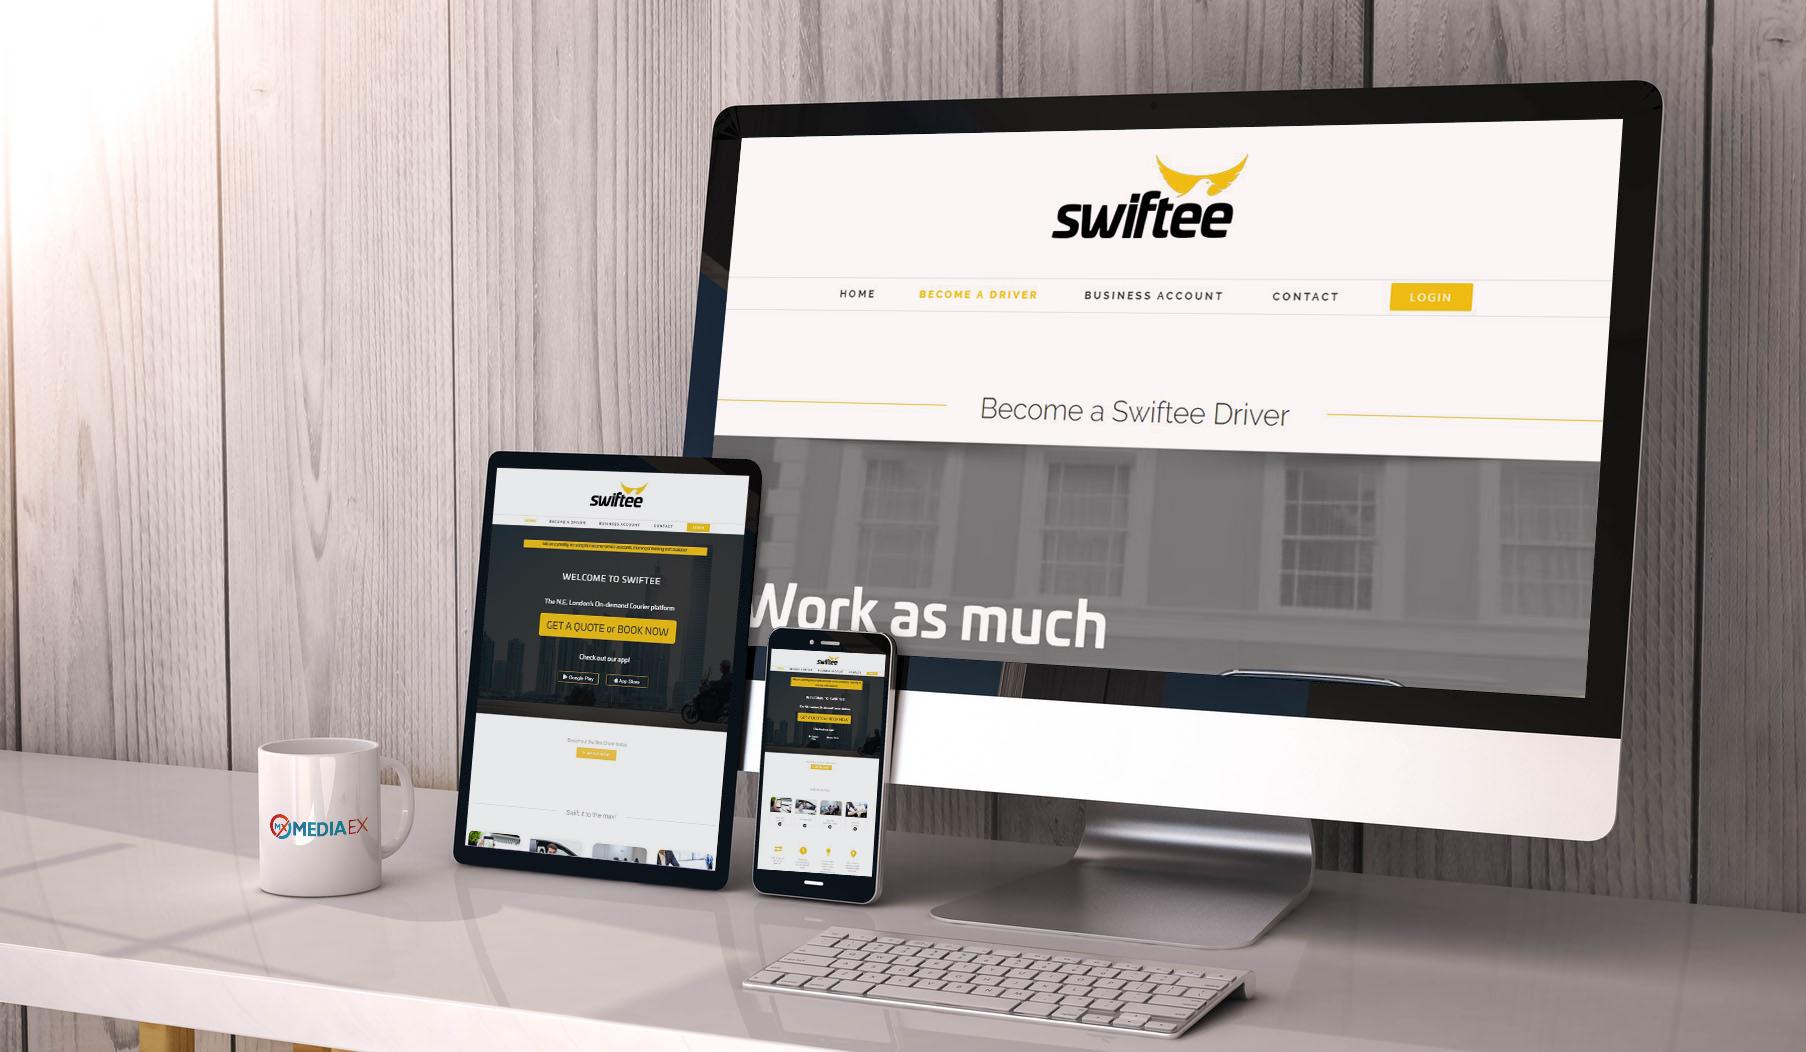 Swiftee